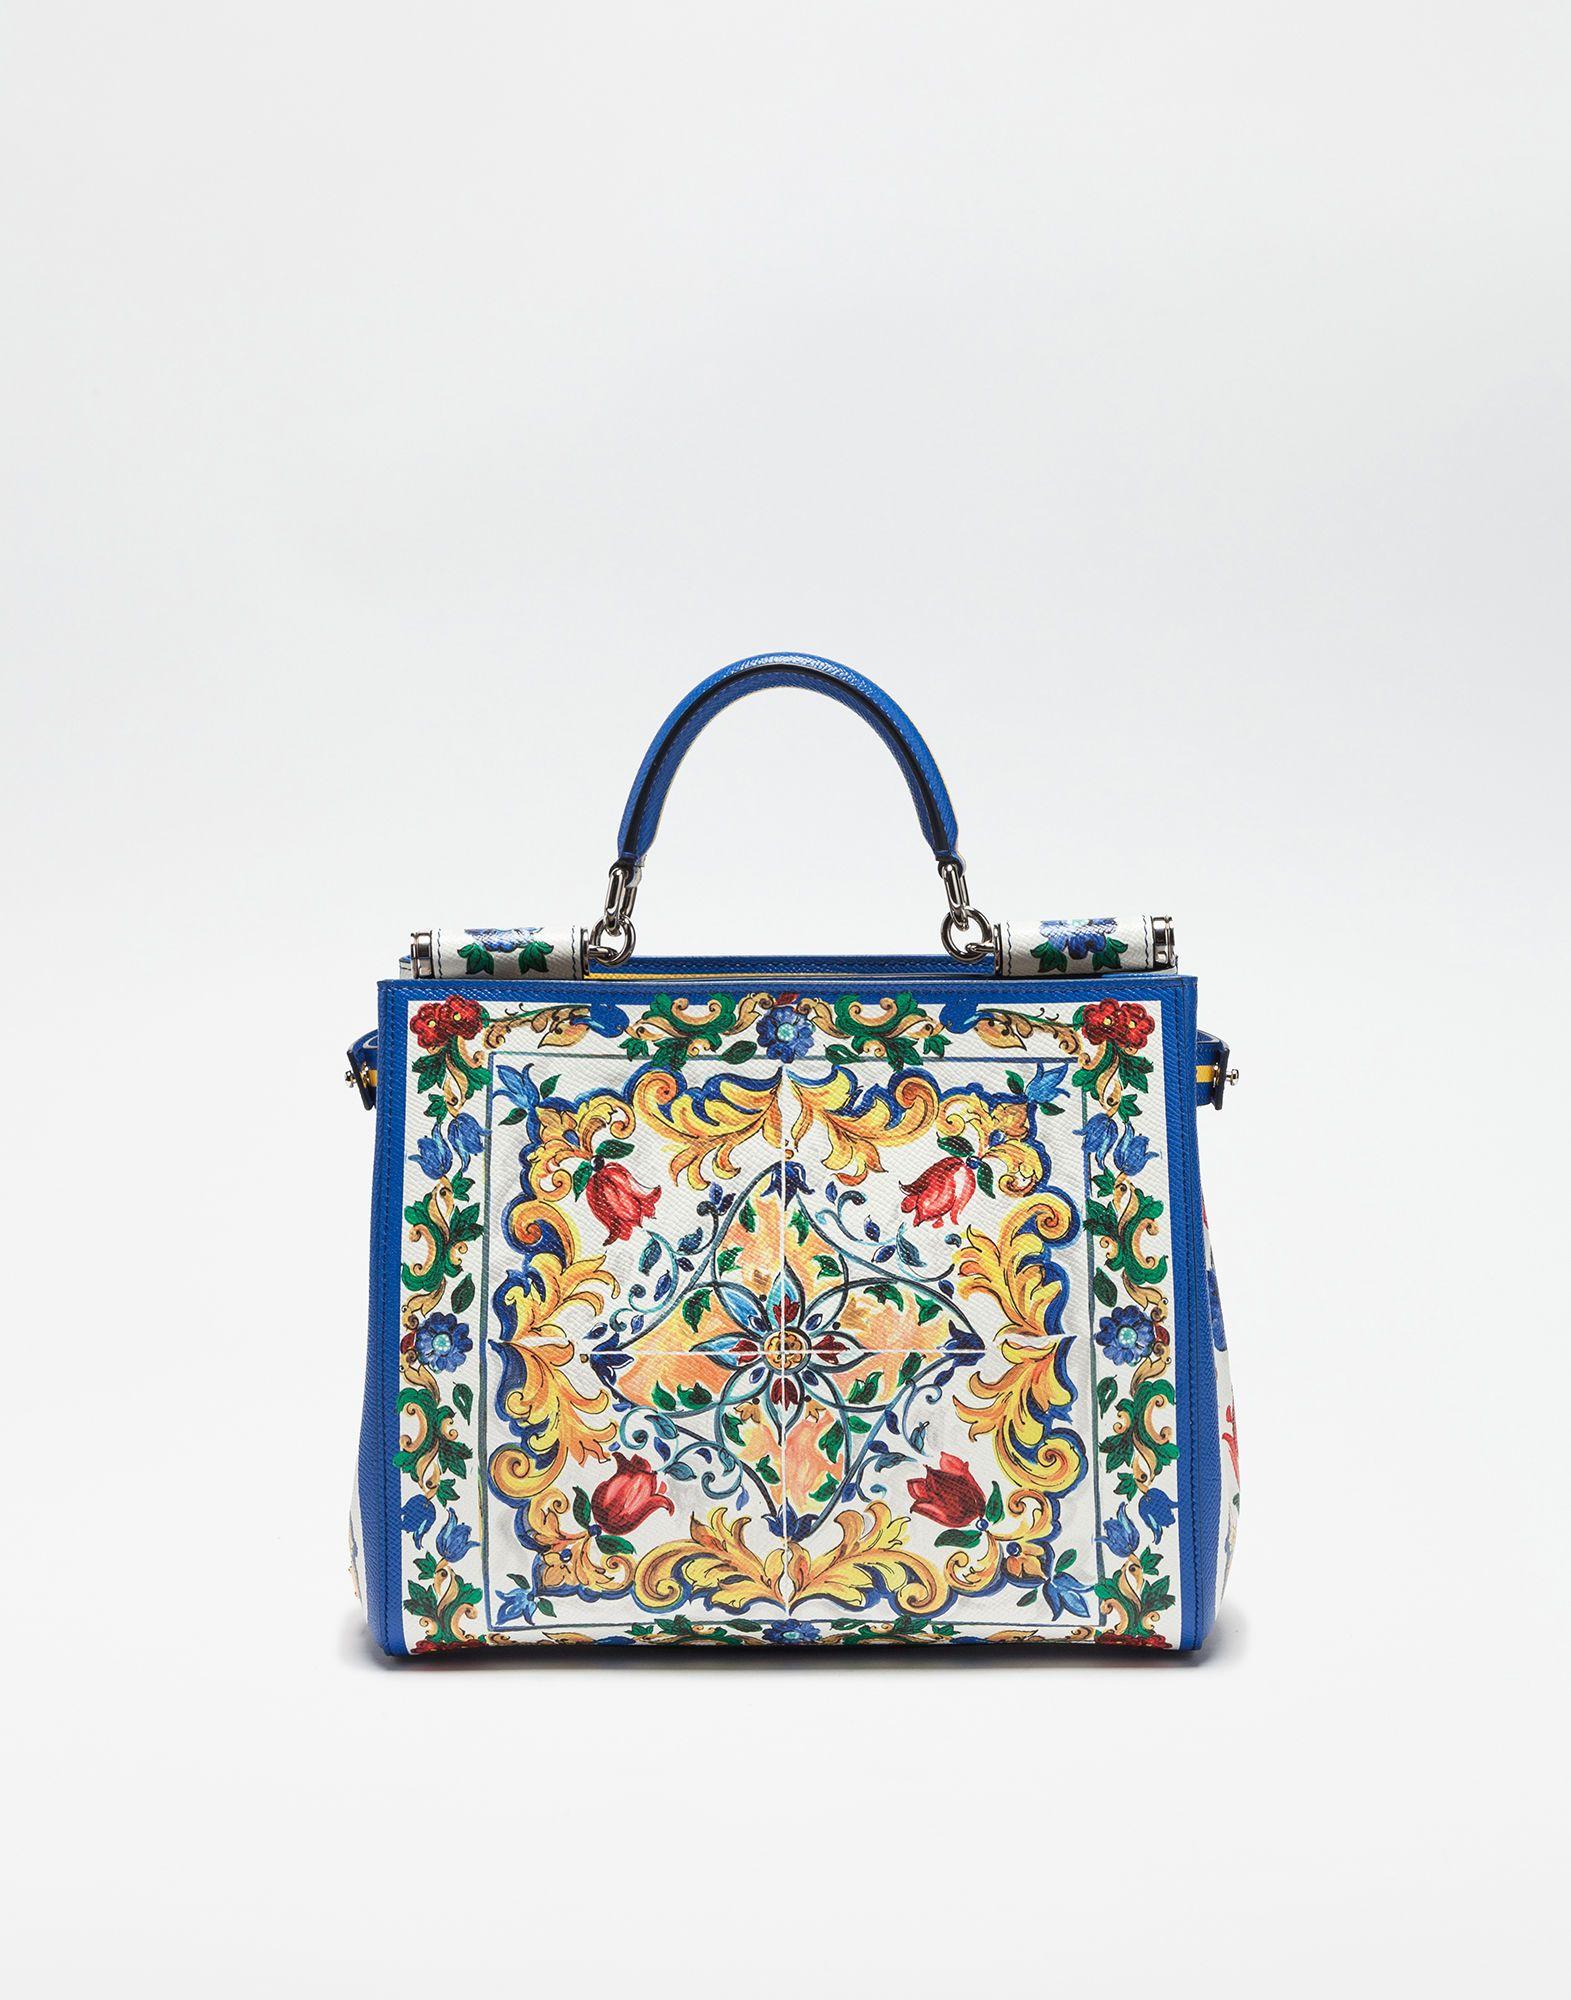 26a915c96603 Dolce Gabbana  PRINTED DAUPHINE LEATHER SICILY SHOPPER